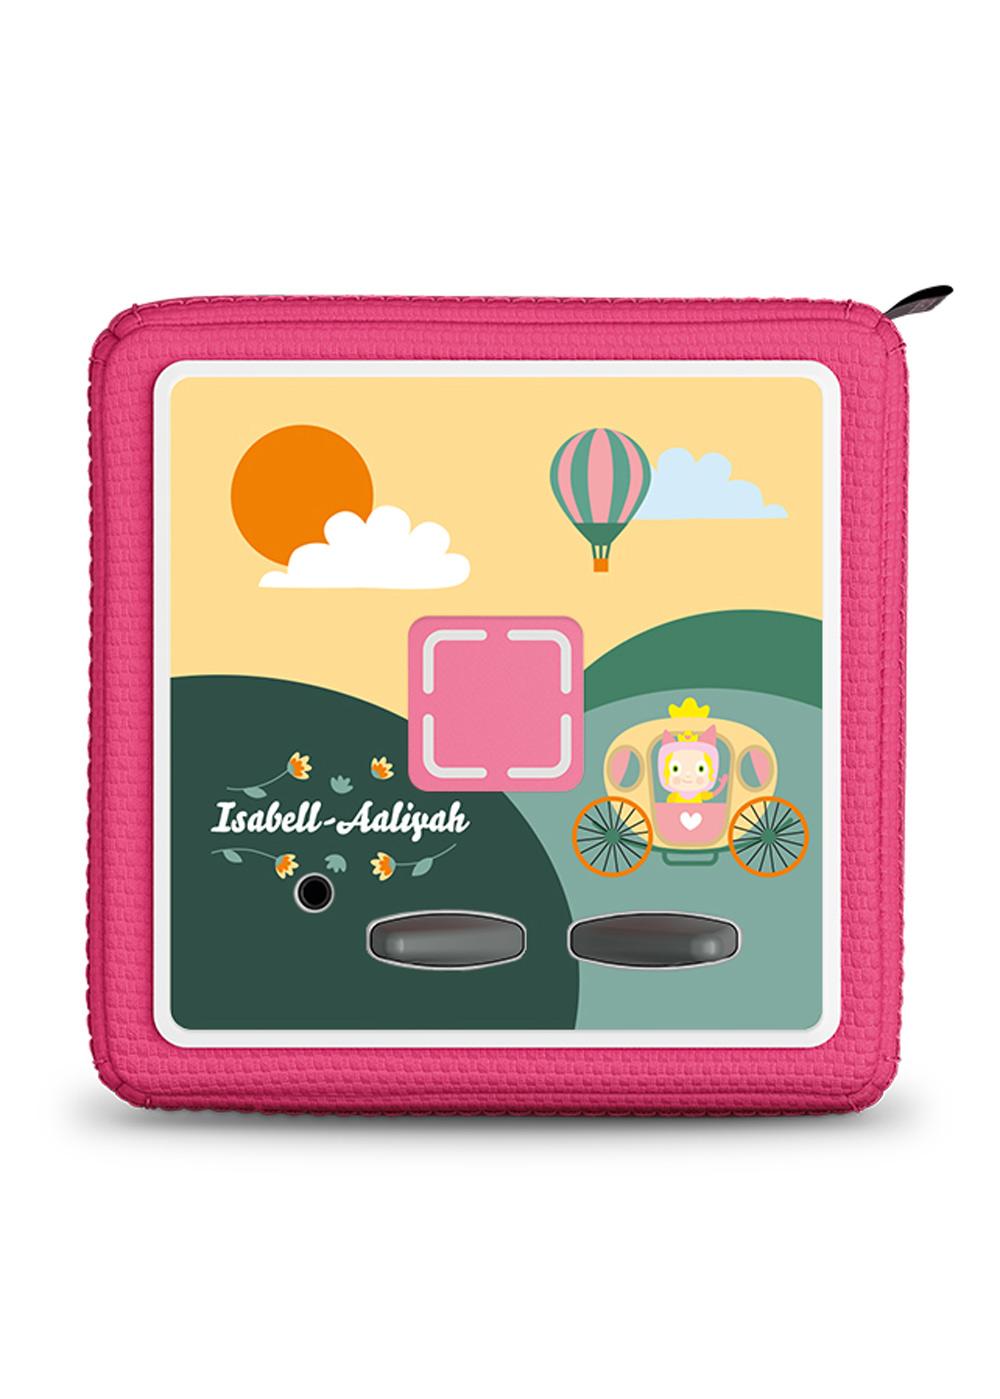 dekofolie toniebox zauberfahrt personalisiert kindername 1